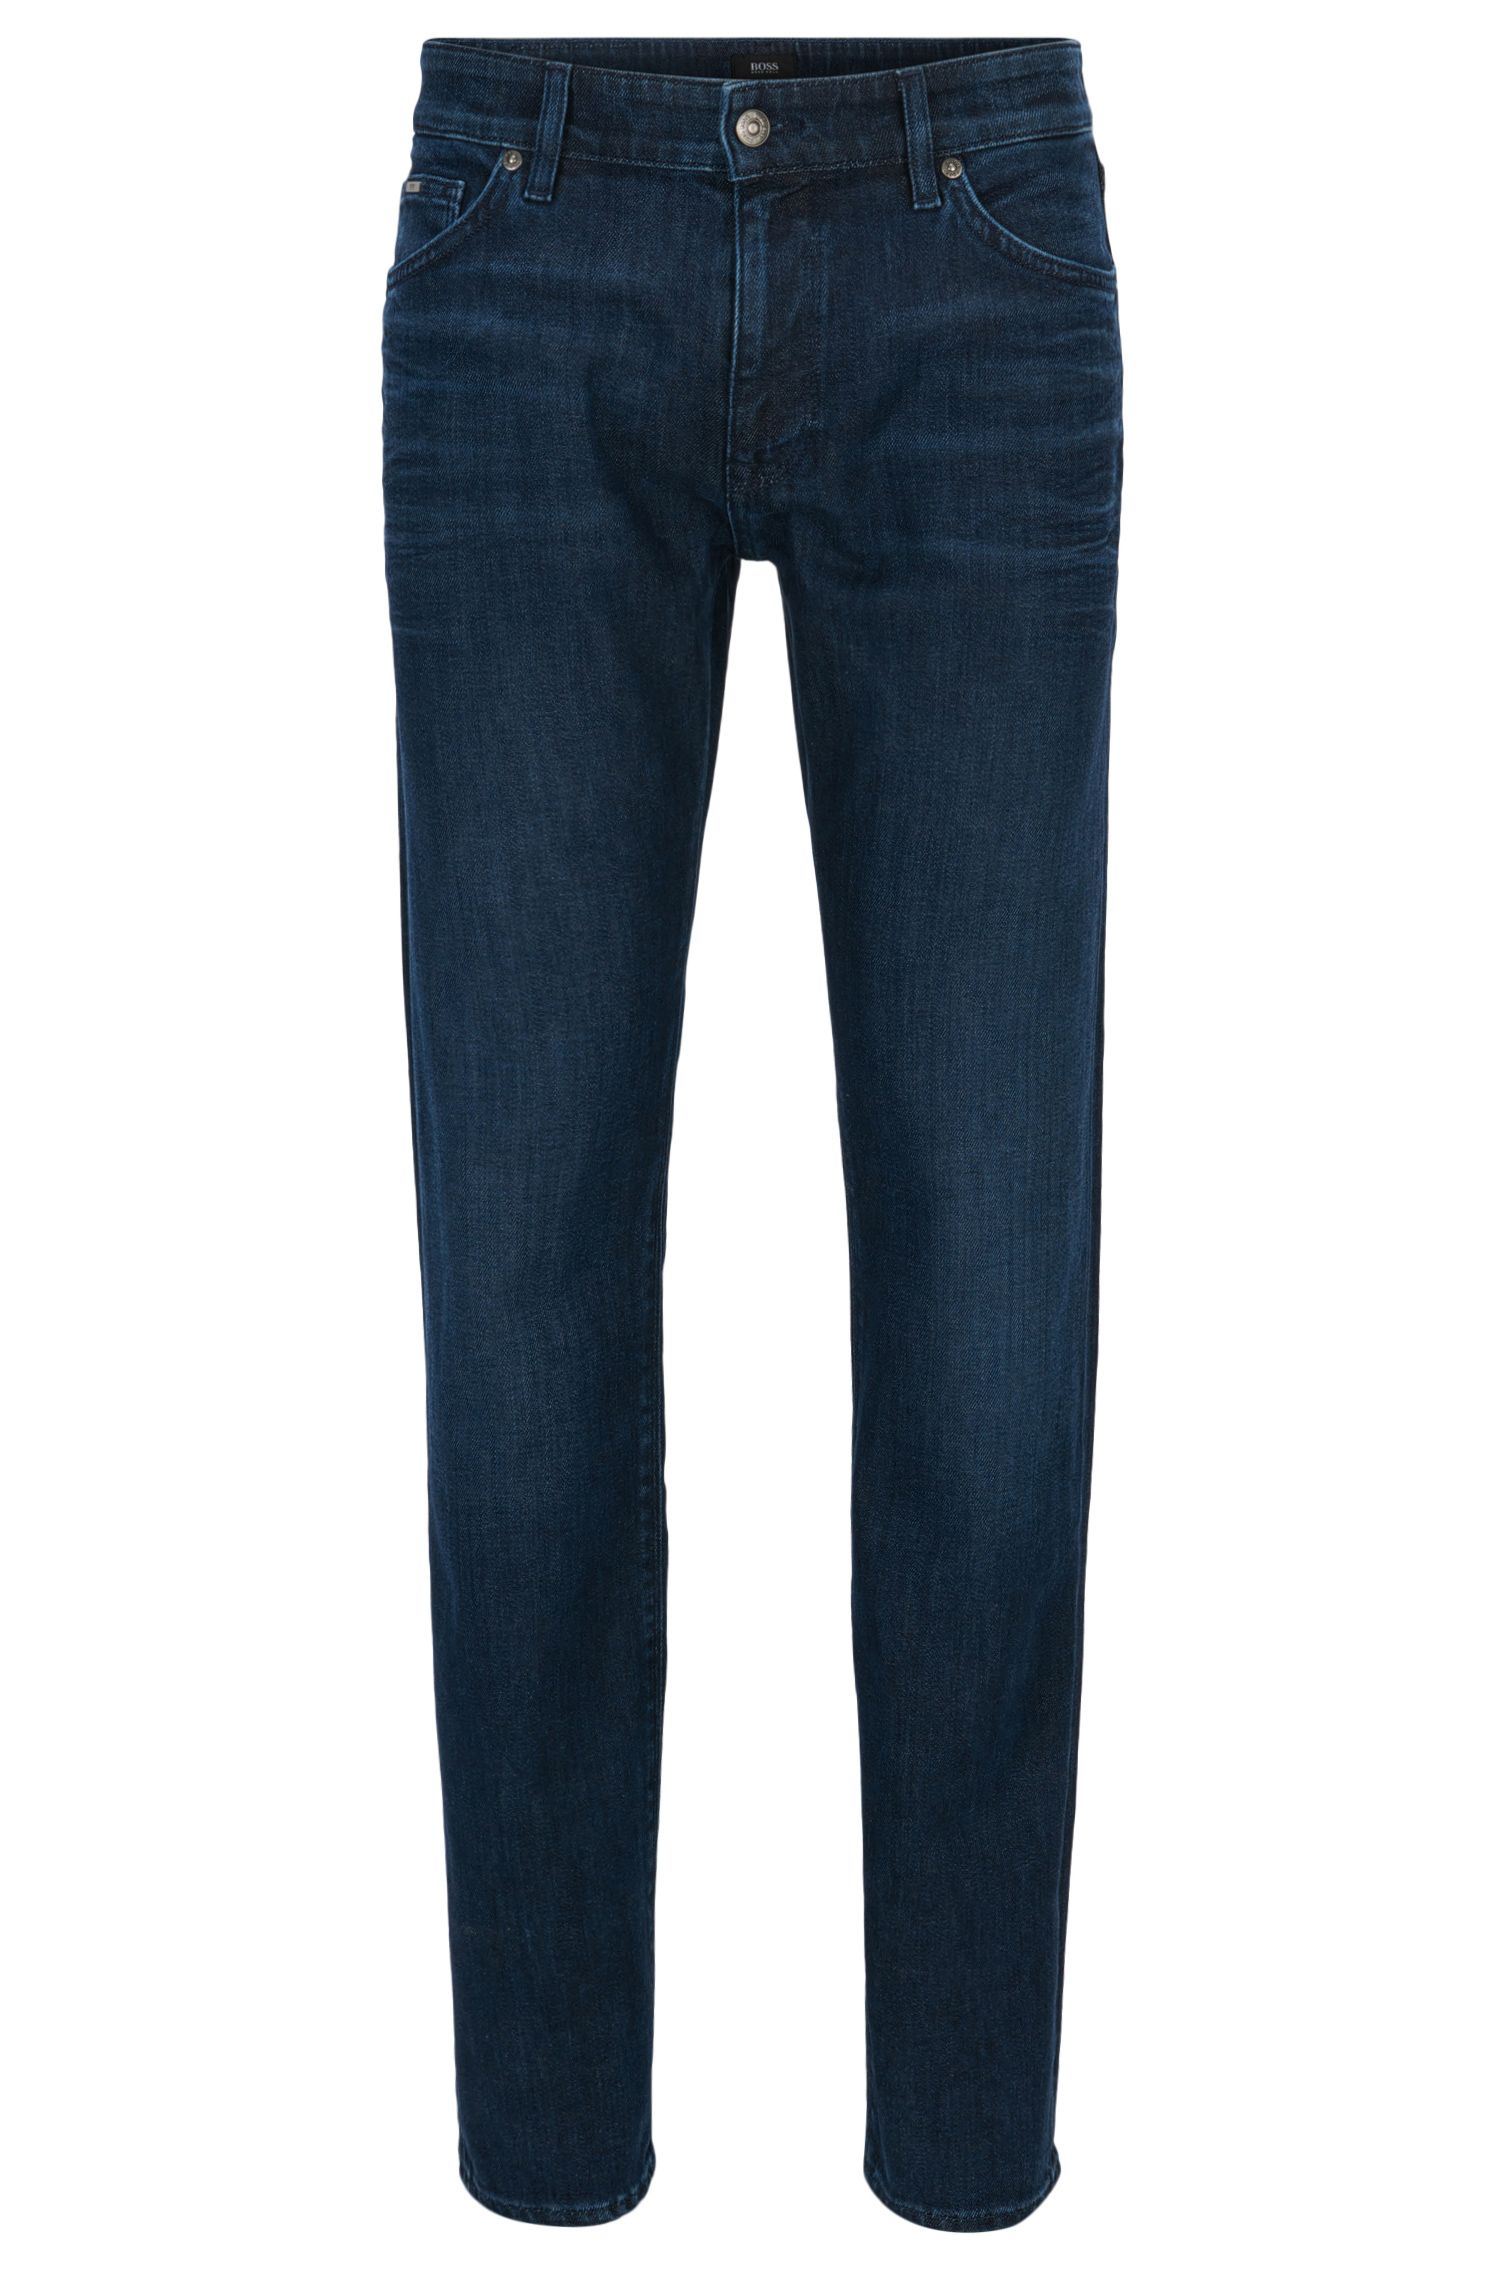 Dark-blue mid-wash stretch-denim jeans in a regular fit